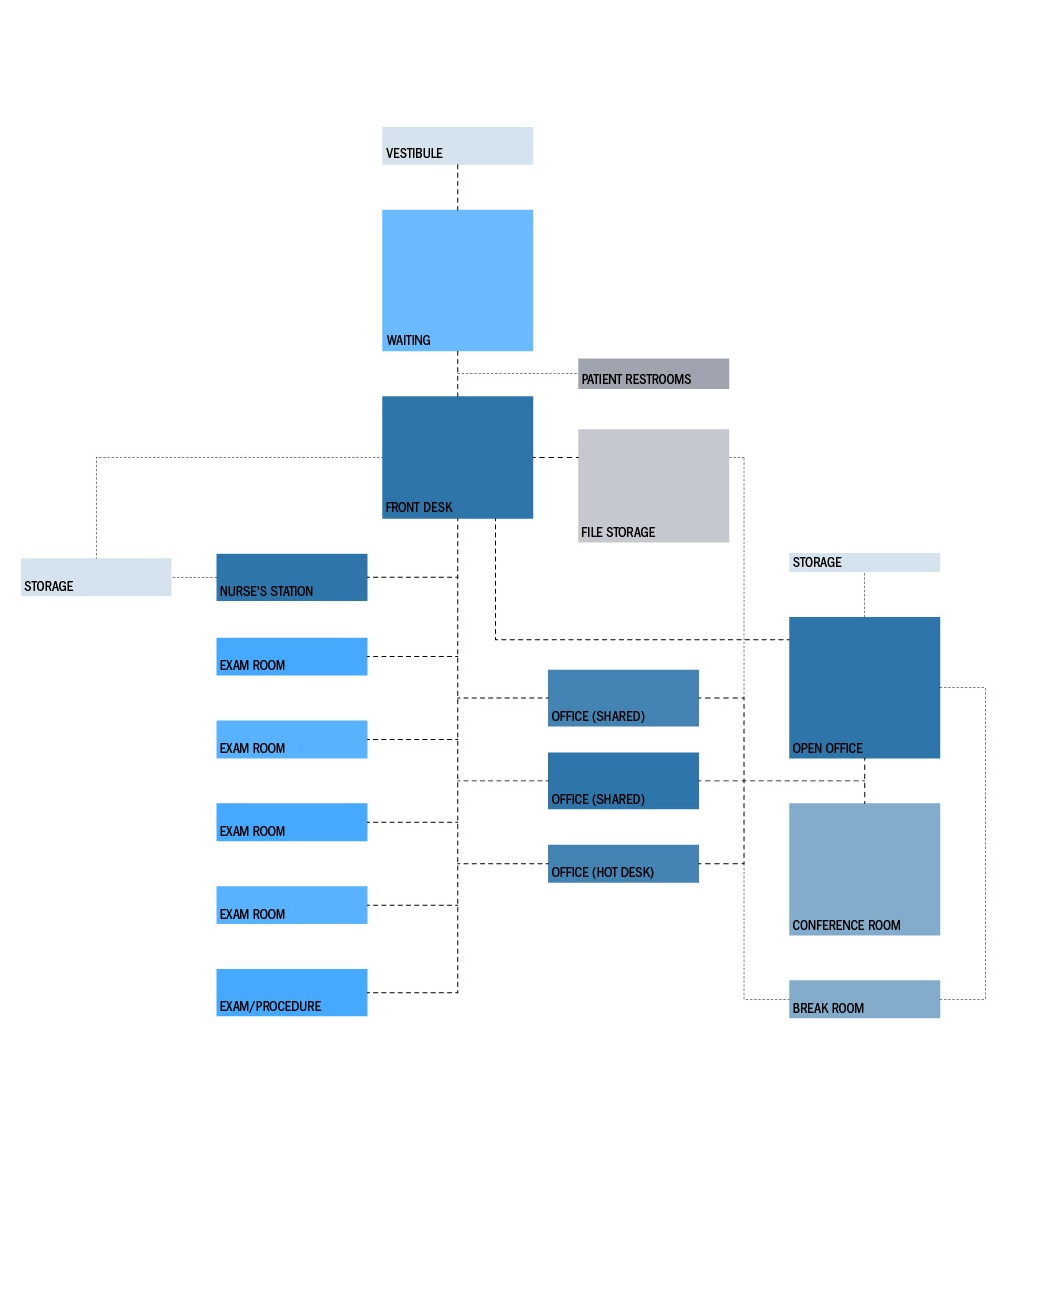 BubbleDiagram1.jpg